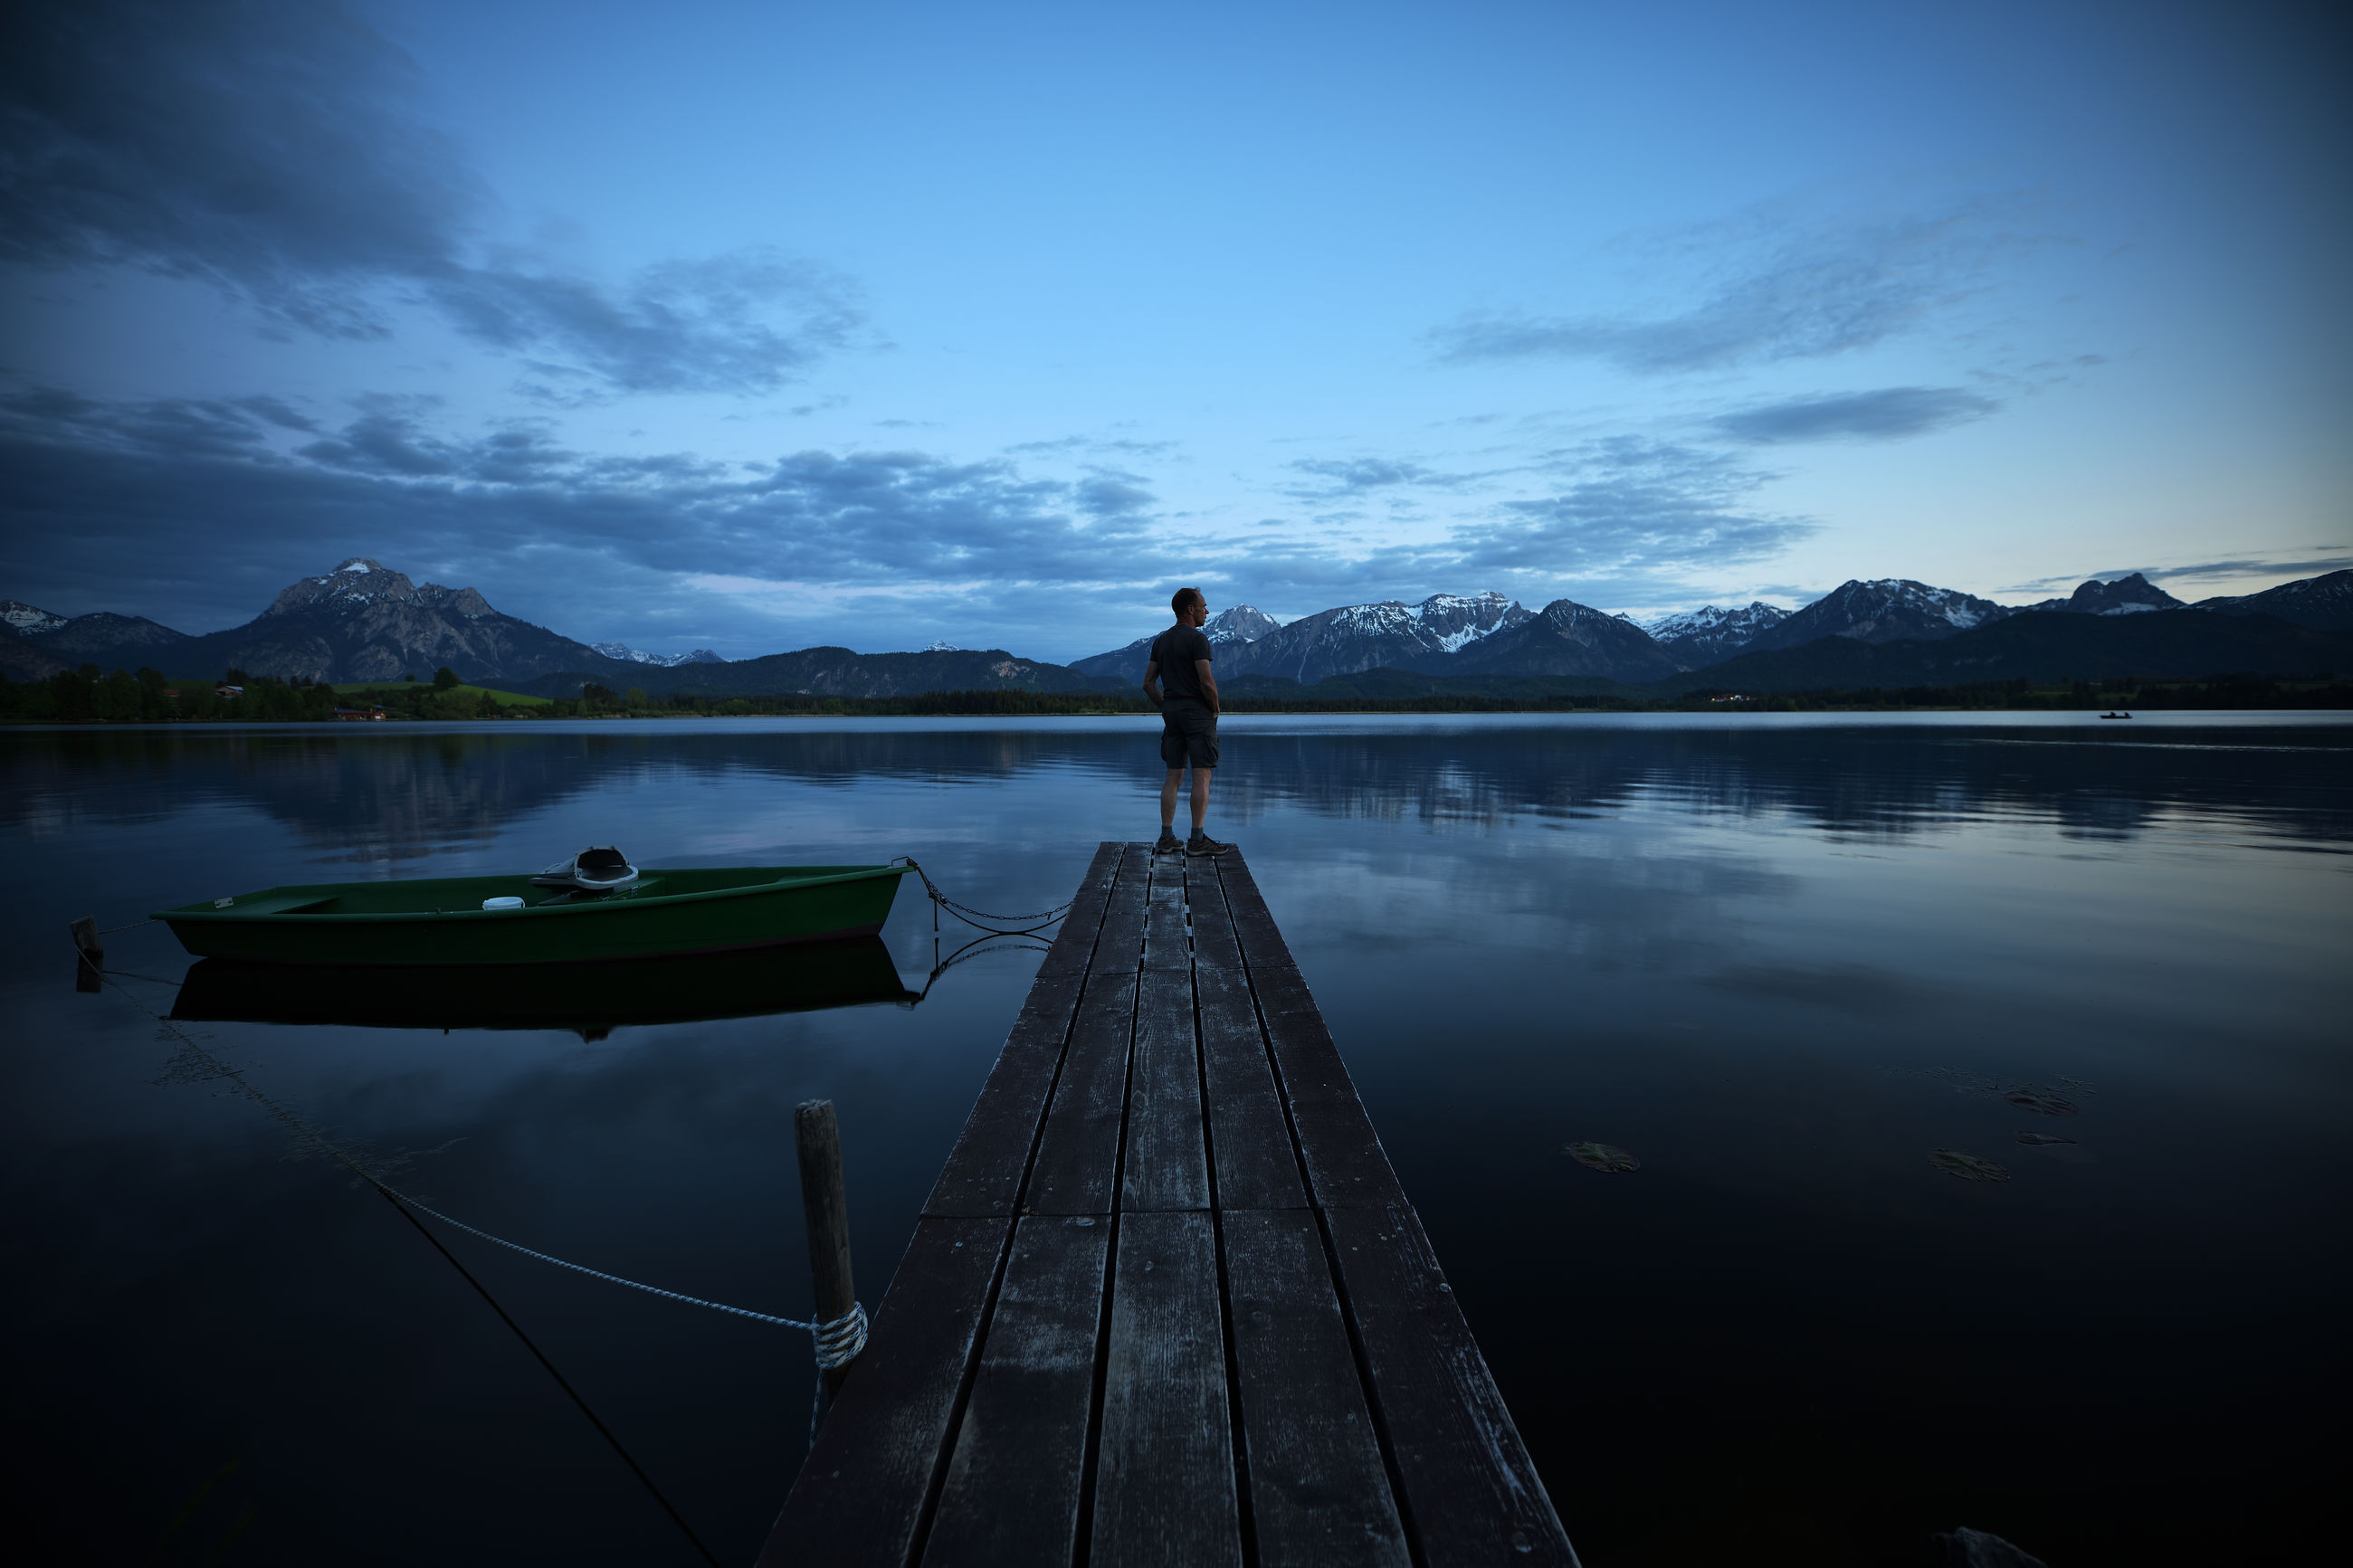 Man standing on pier over lake against sky